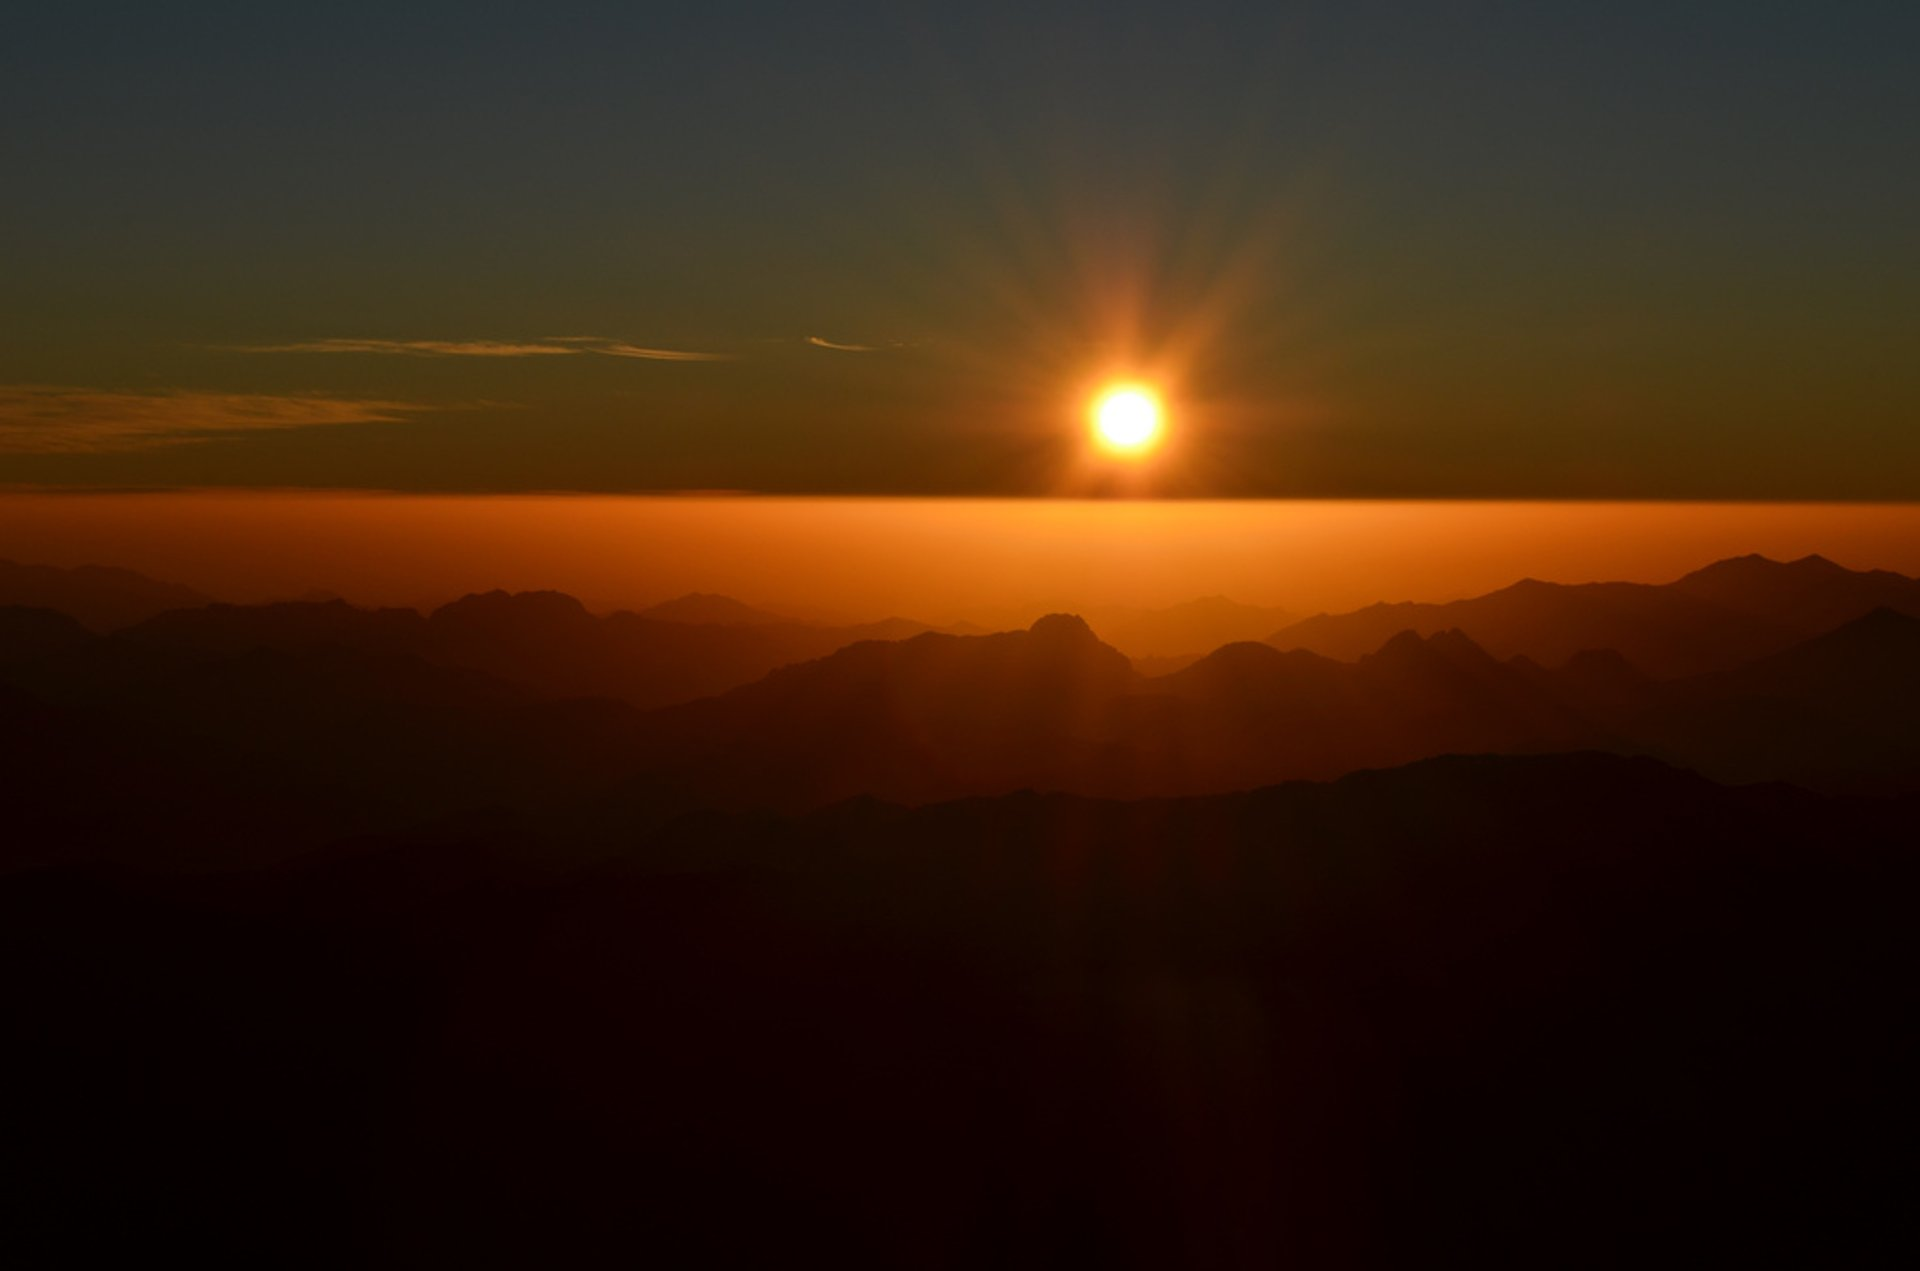 Mount Sinai, the last sunrise of 2012